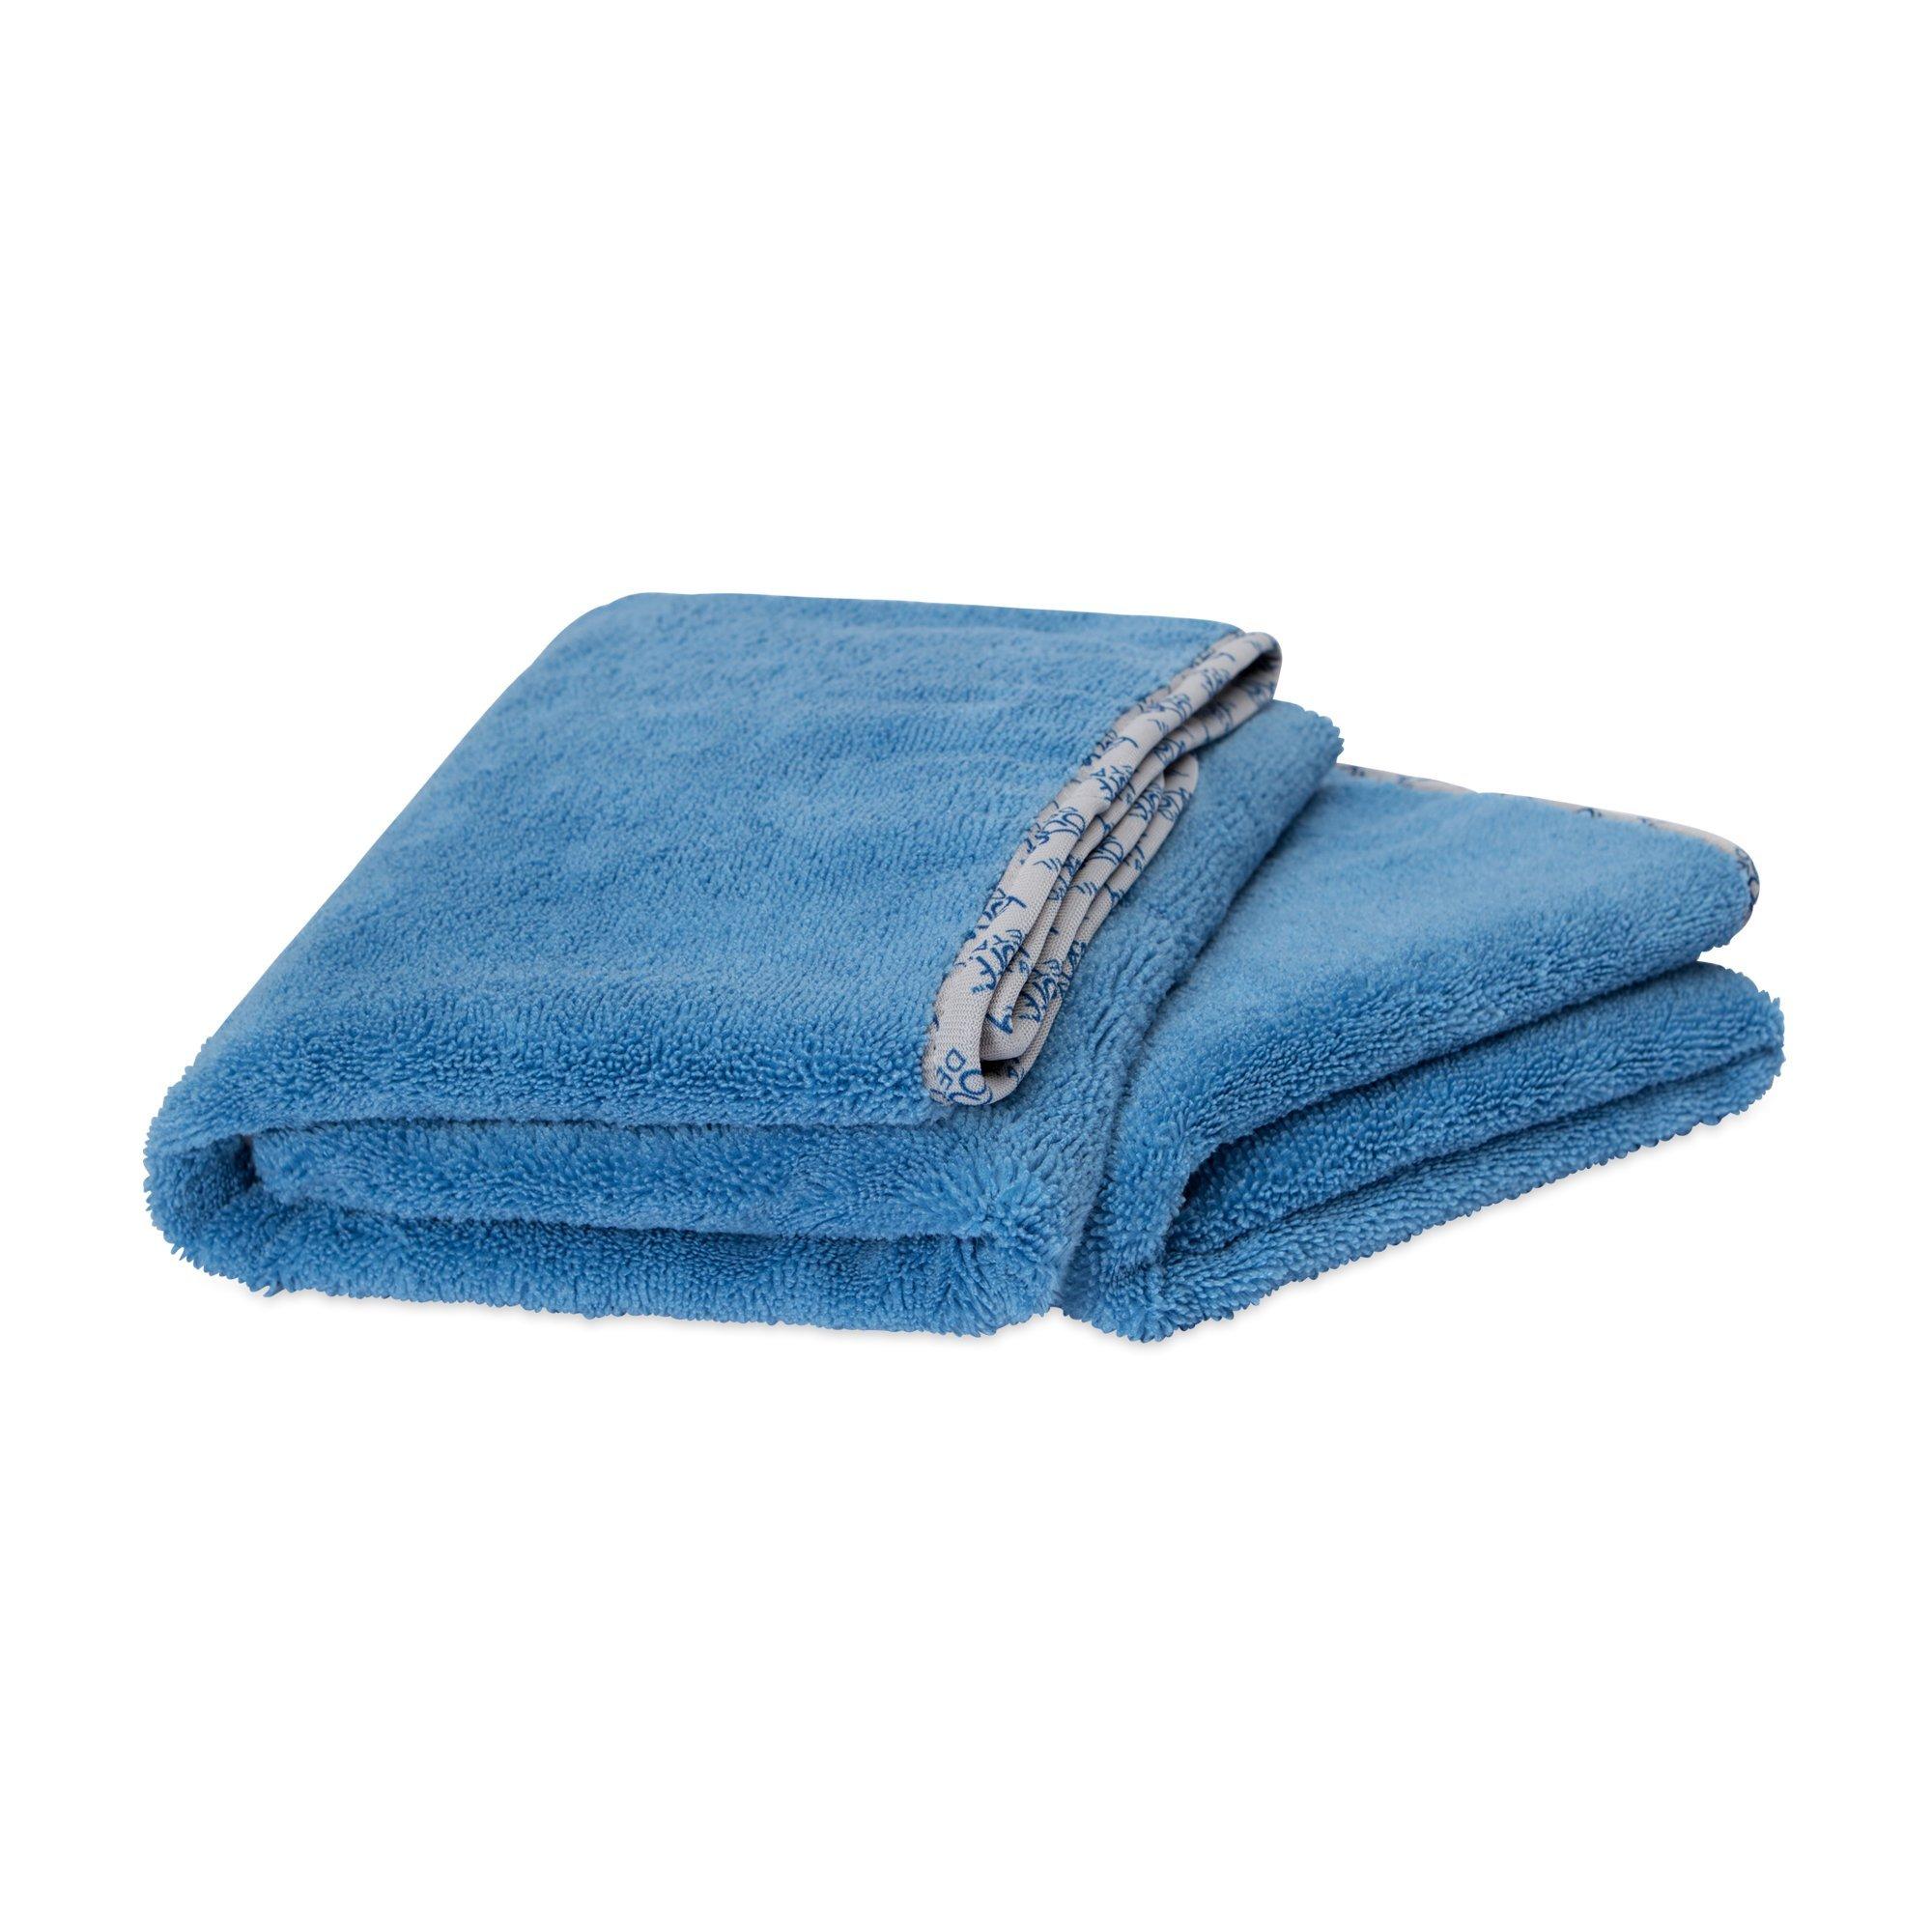 Buff Detail Microfiber Car Towels | 400 GSM | 80/20 Blend | Tagless | Soft Satin Piped Edges | All-Purpose Auto Detailing - Wax, Buff, Polish, Wash, Dry | 24''x 36'' | 2 Pack (Blue)